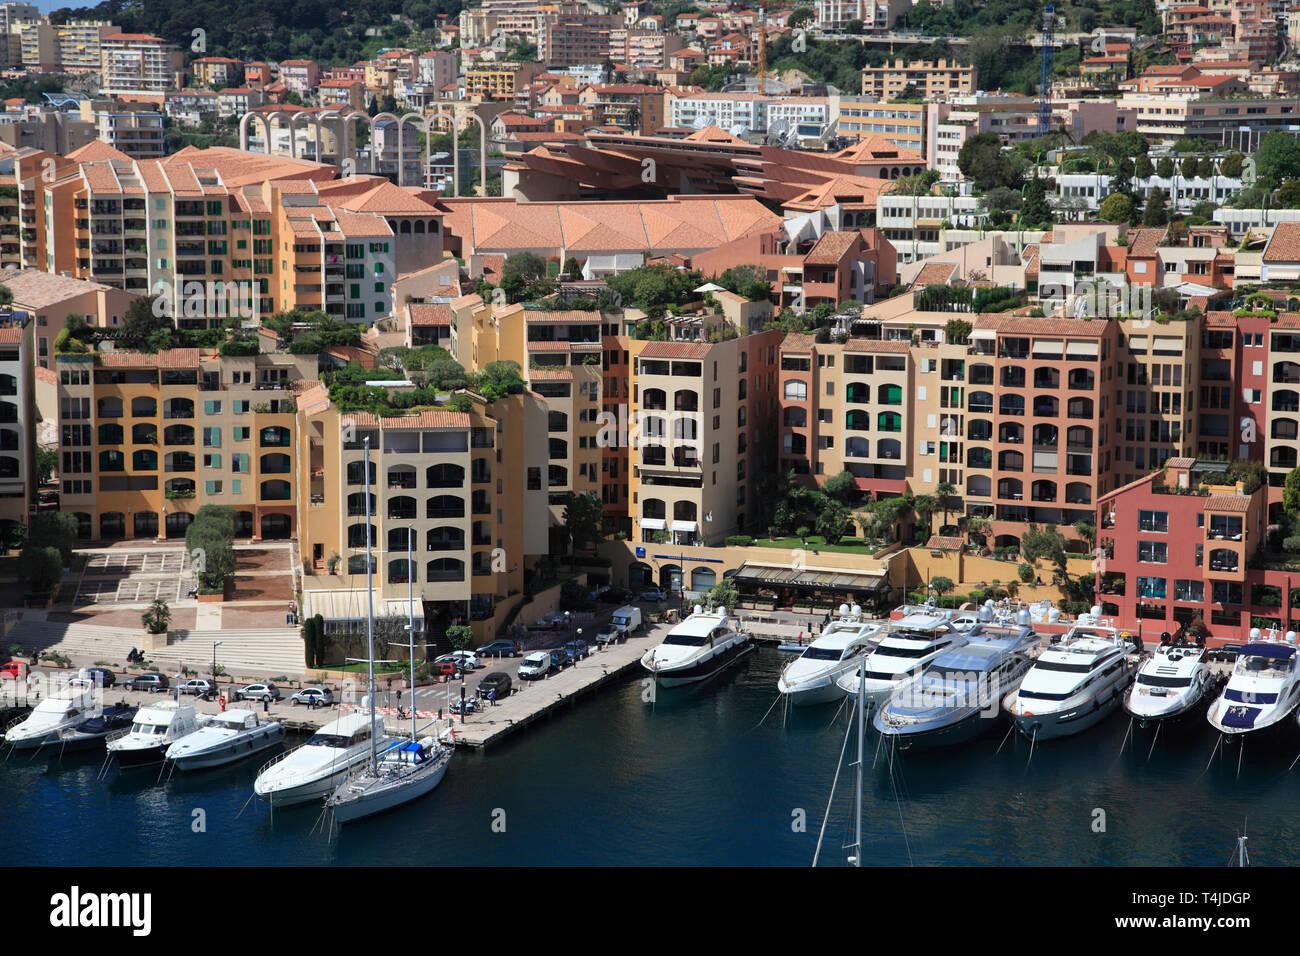 Port of Fontvieille, Fontvieille Harbor, Fontvieille, Monaco, Cote d Azur, Mediterranean, Europe - Stock Image